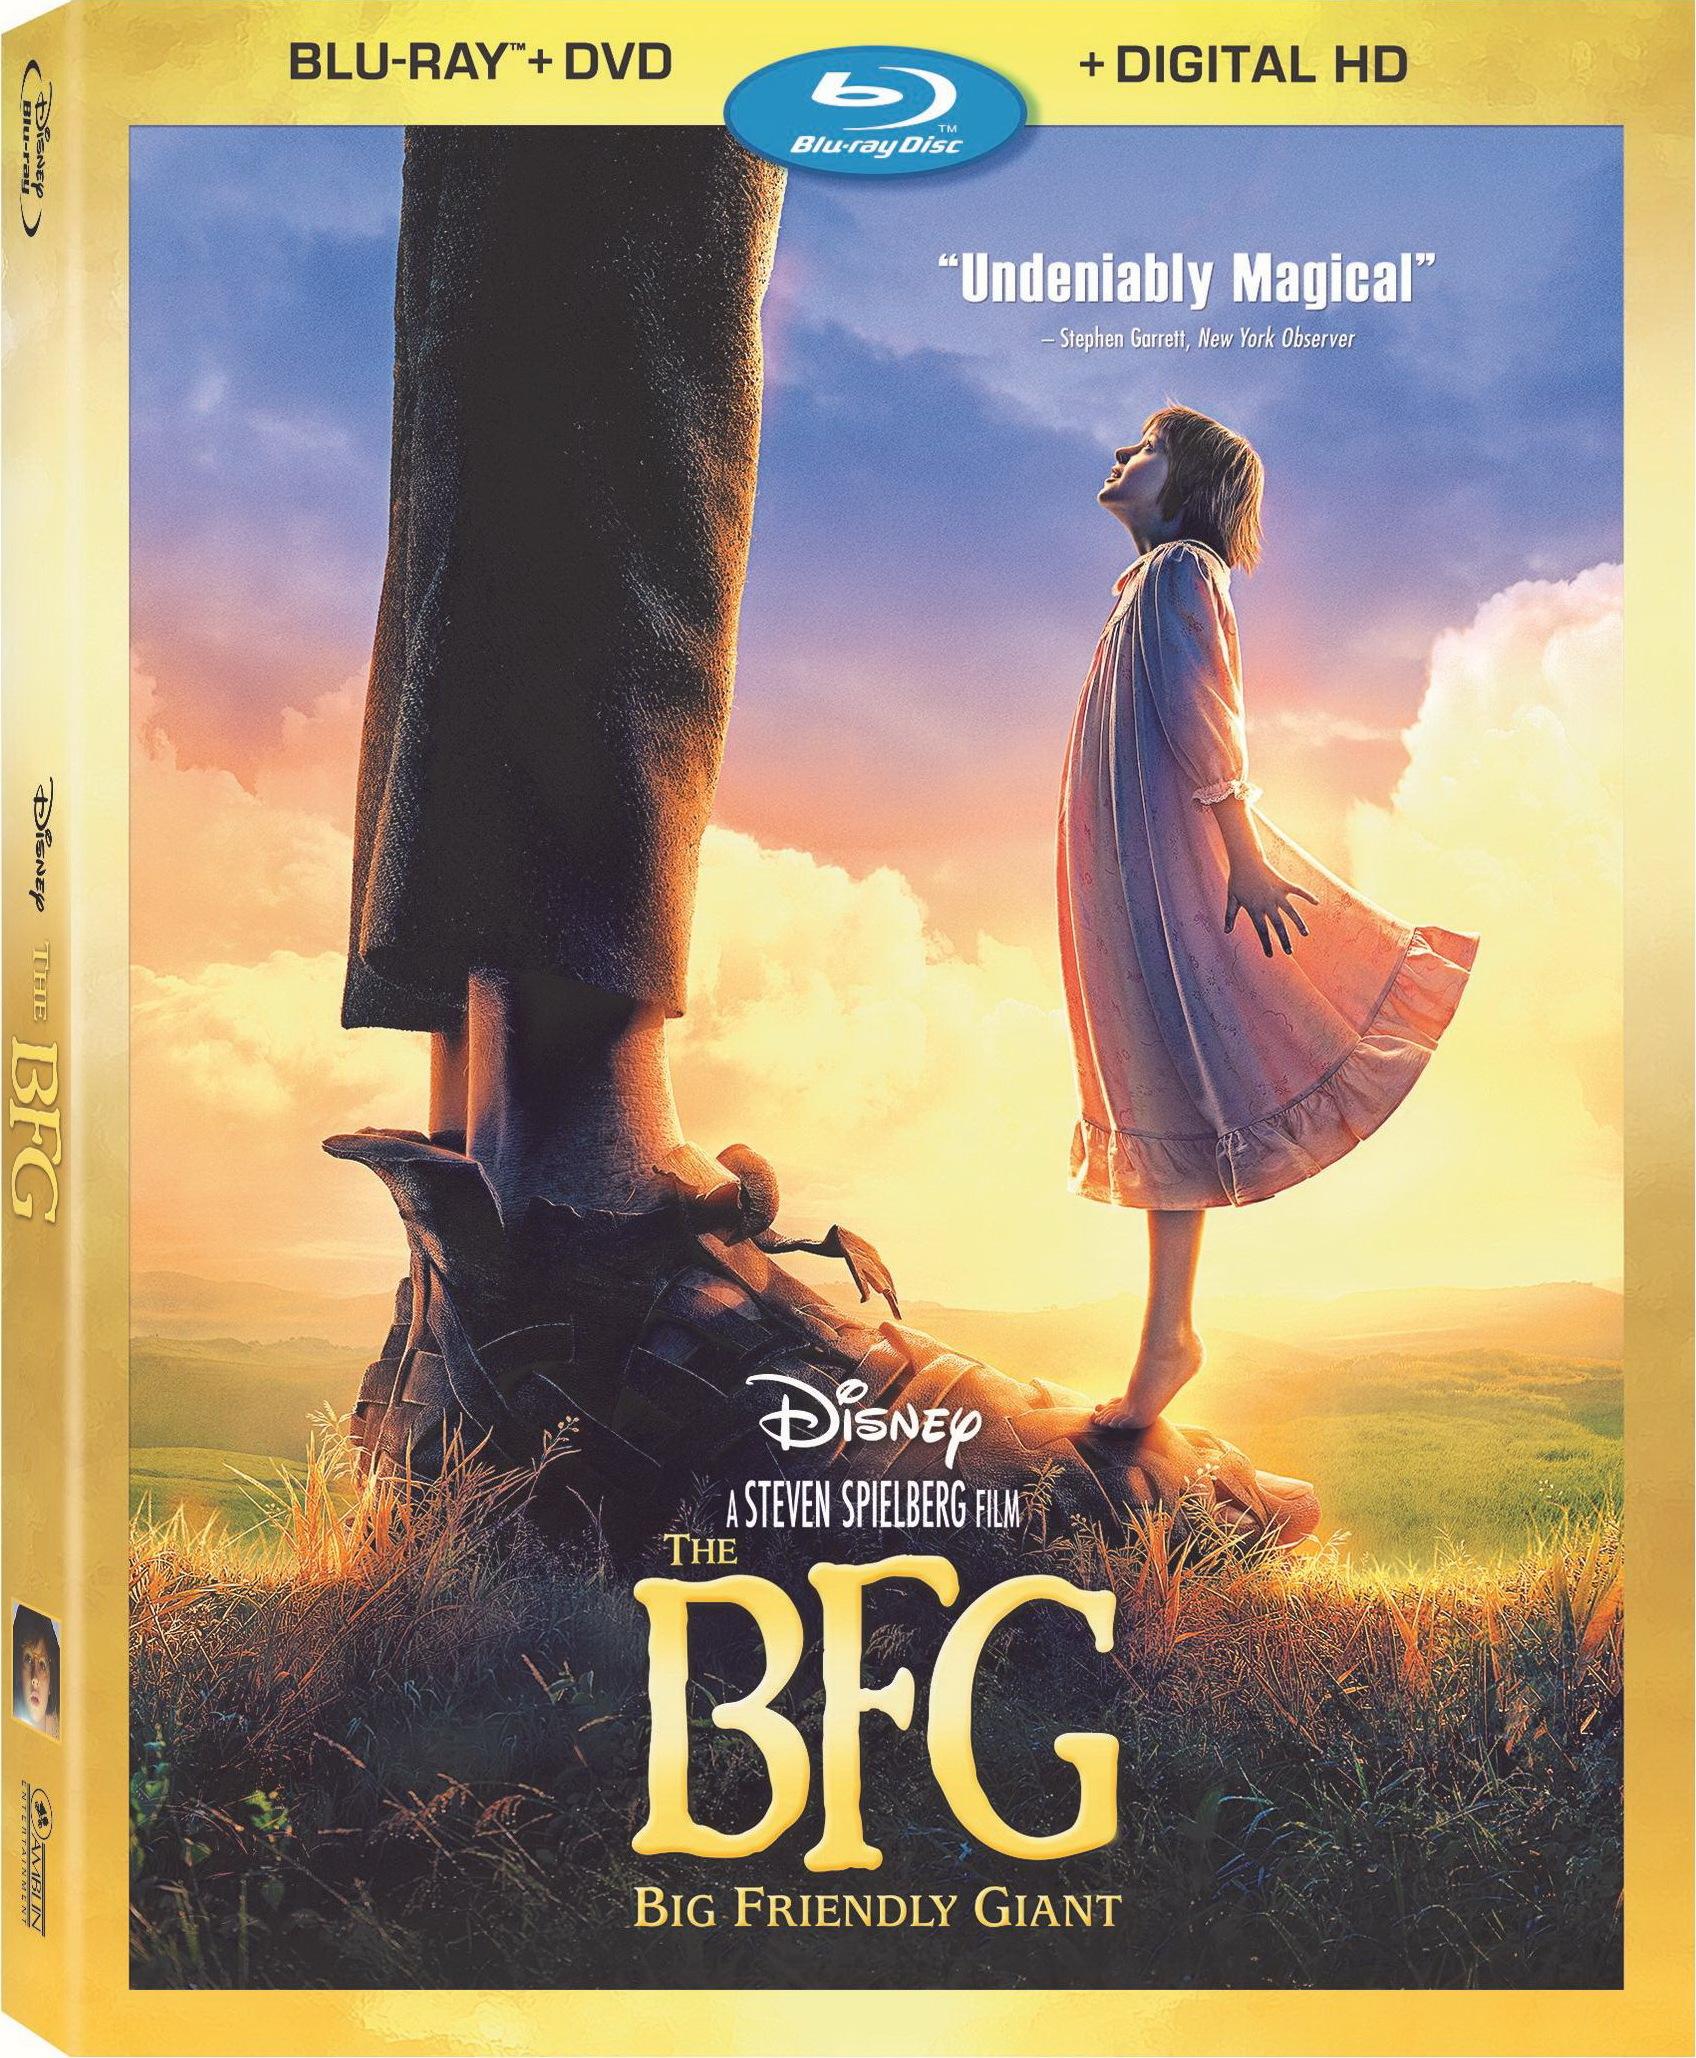 The BFG (2016) poster image